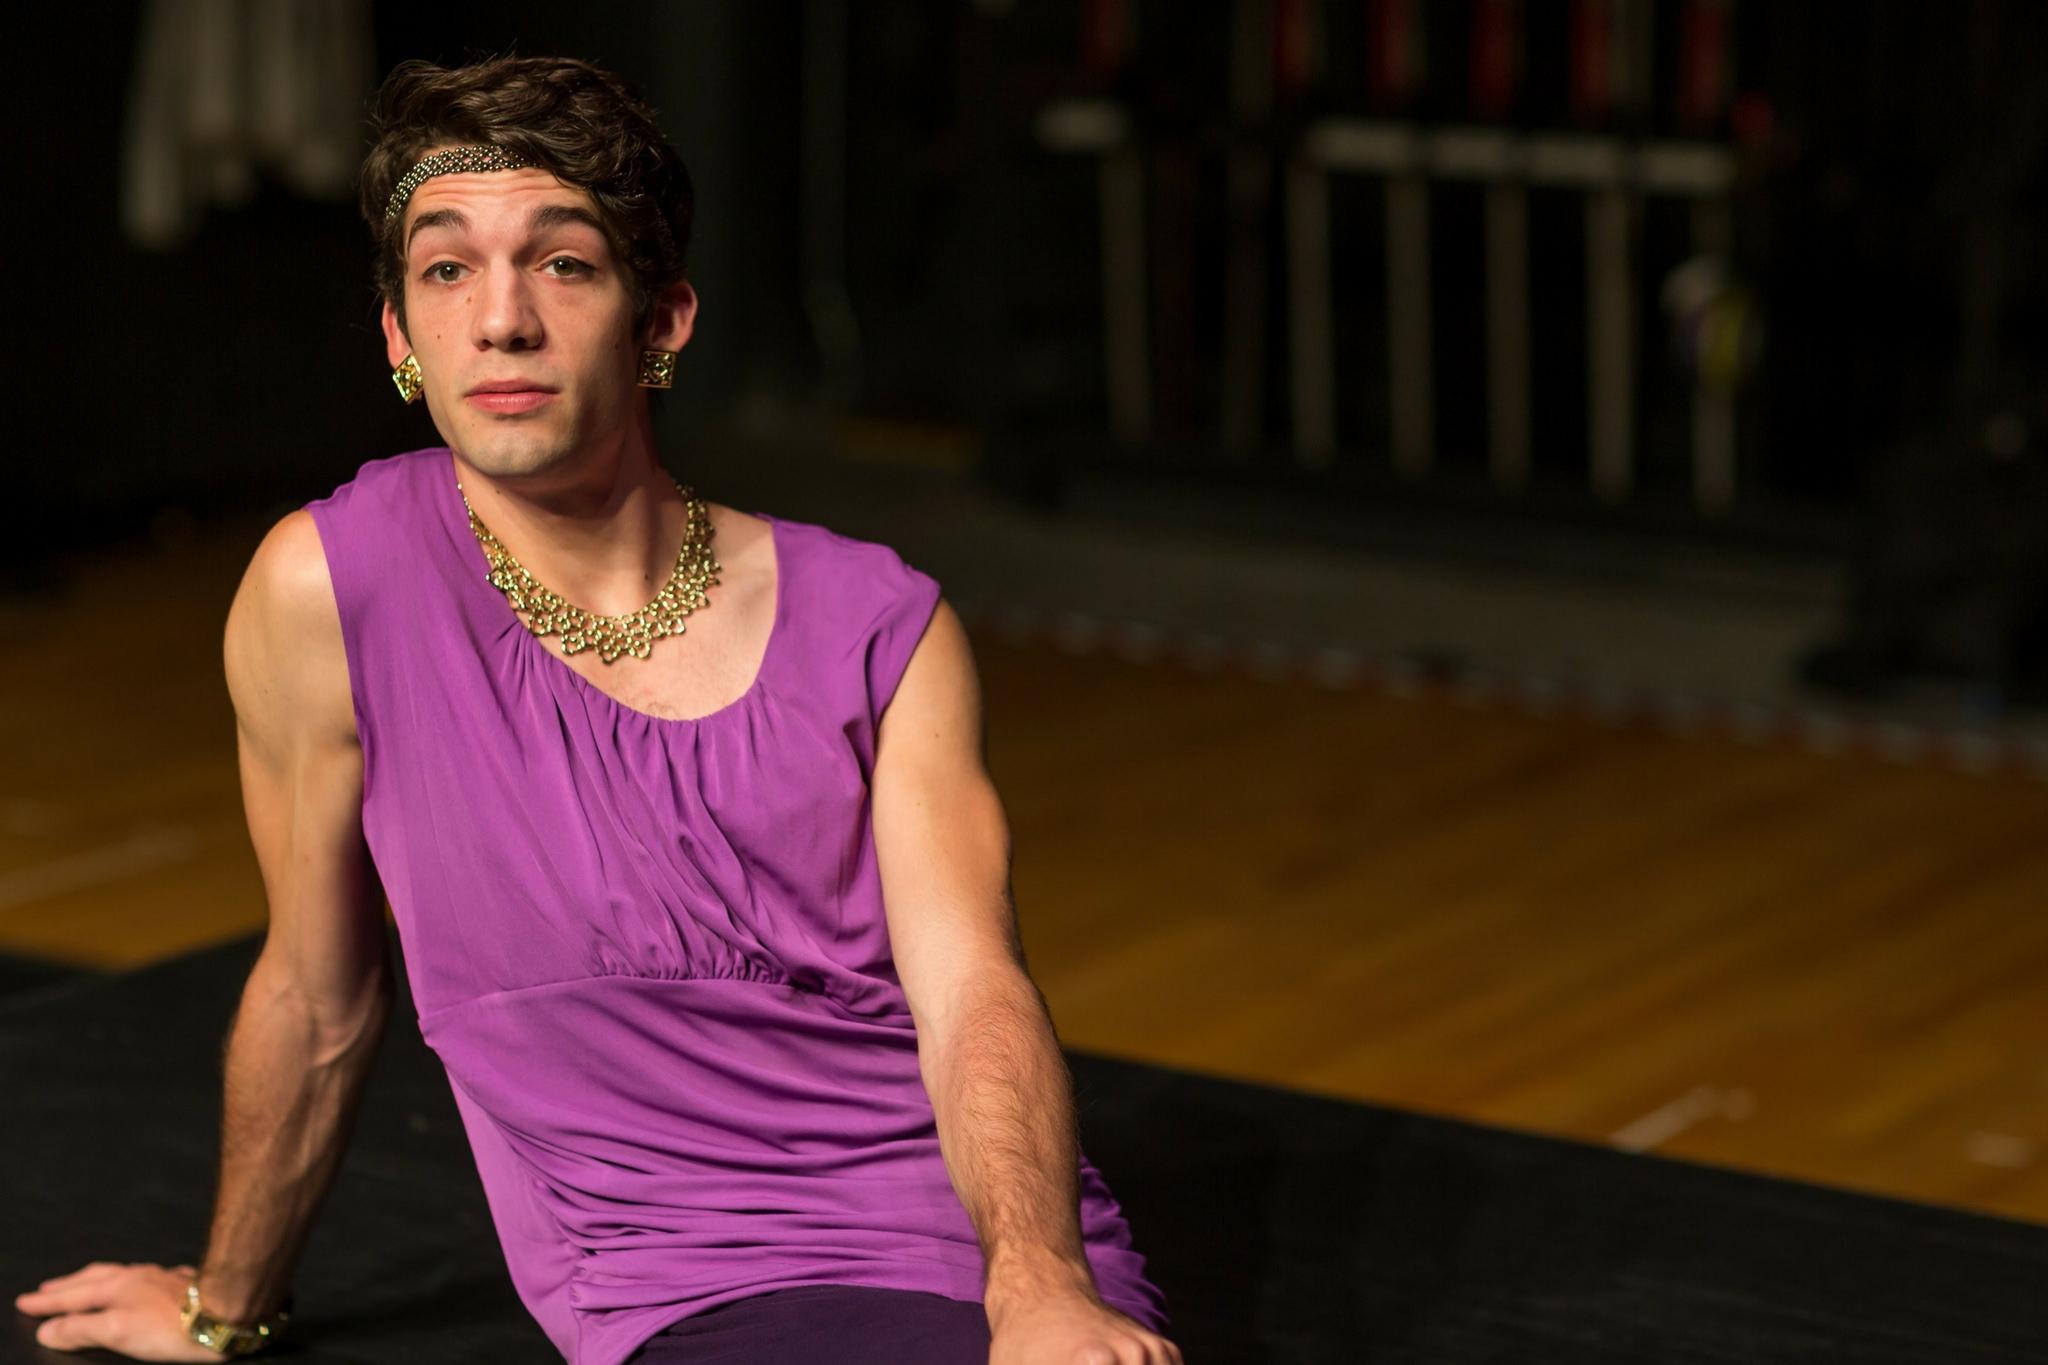 Joey Tyler (Queen) in Cymbaline, Apprentice Program, 2016-Photo by Nile Hawver